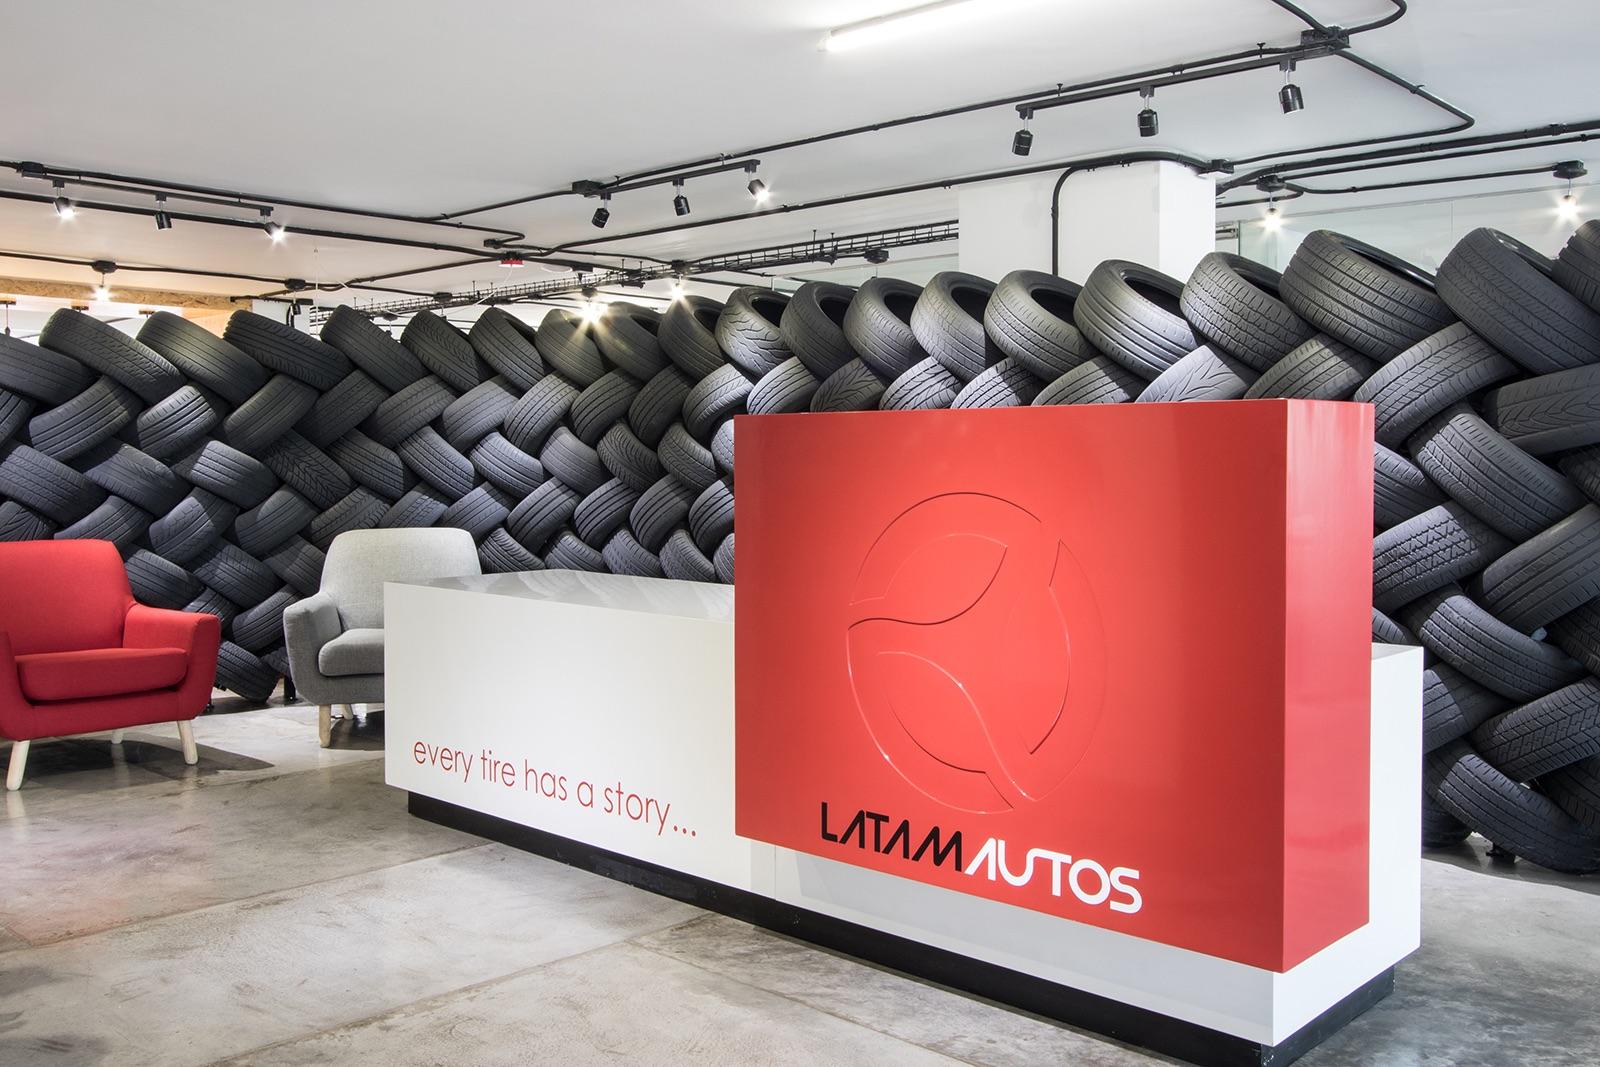 latam-auto-mexico-office-4